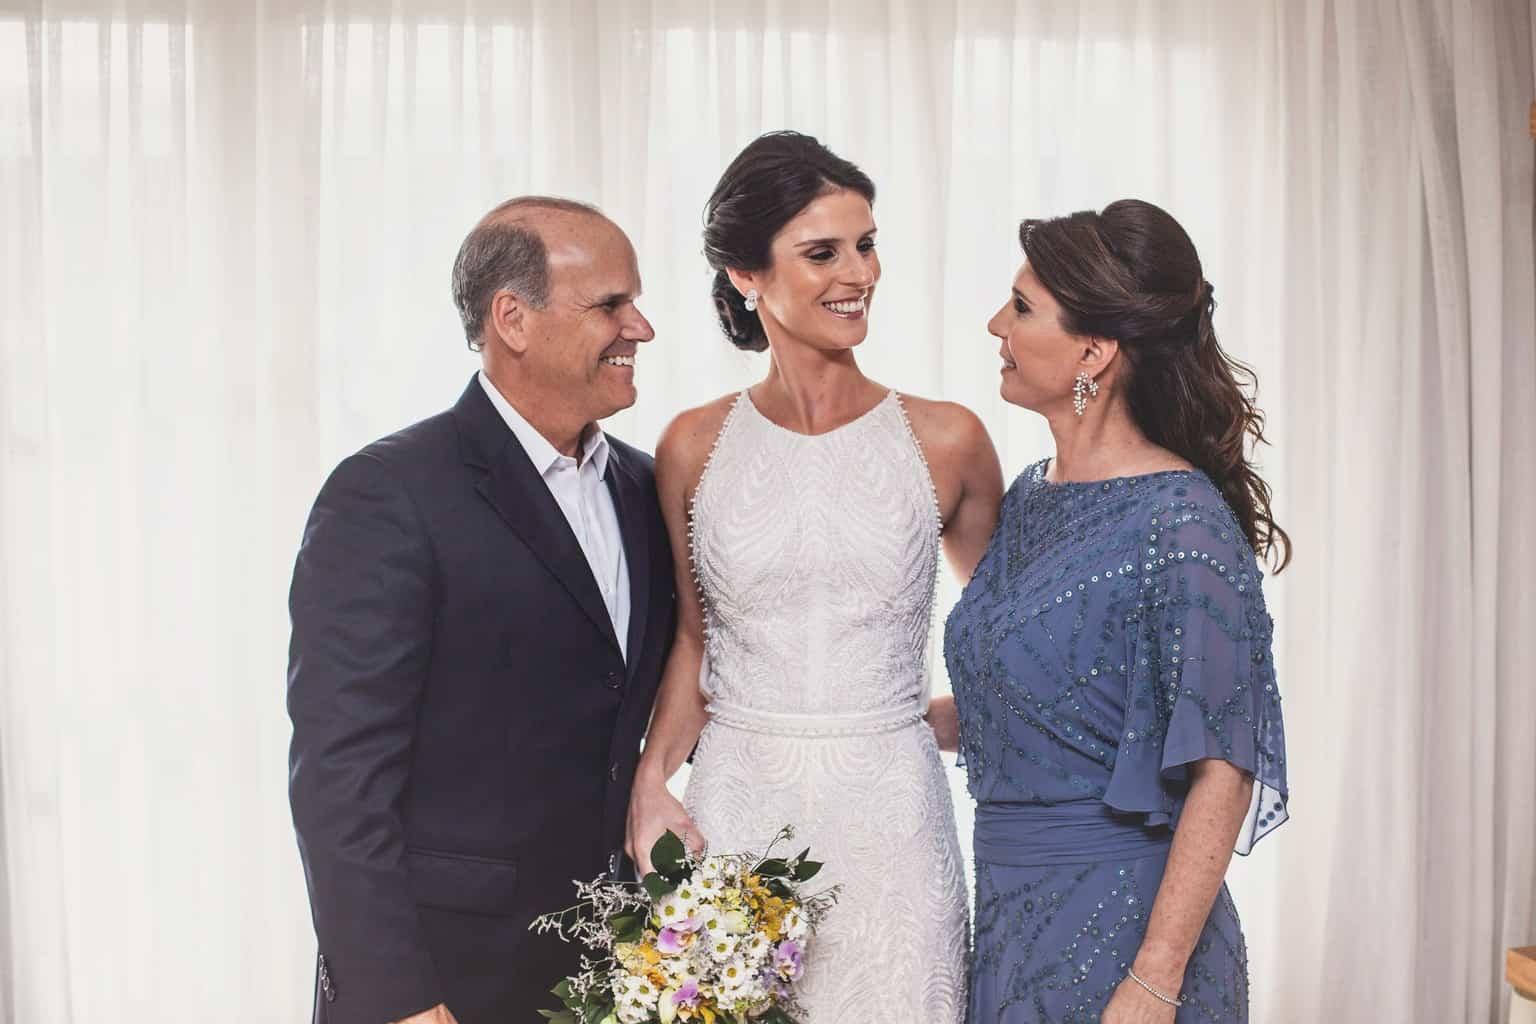 casamento-Ana-Cecilia-e-Leonardo-casamento-na-serra-graviola-filmes-graviolafilmes-laura-camapnella-de-siervi-lauracampanella-studio-laura-camapnella47